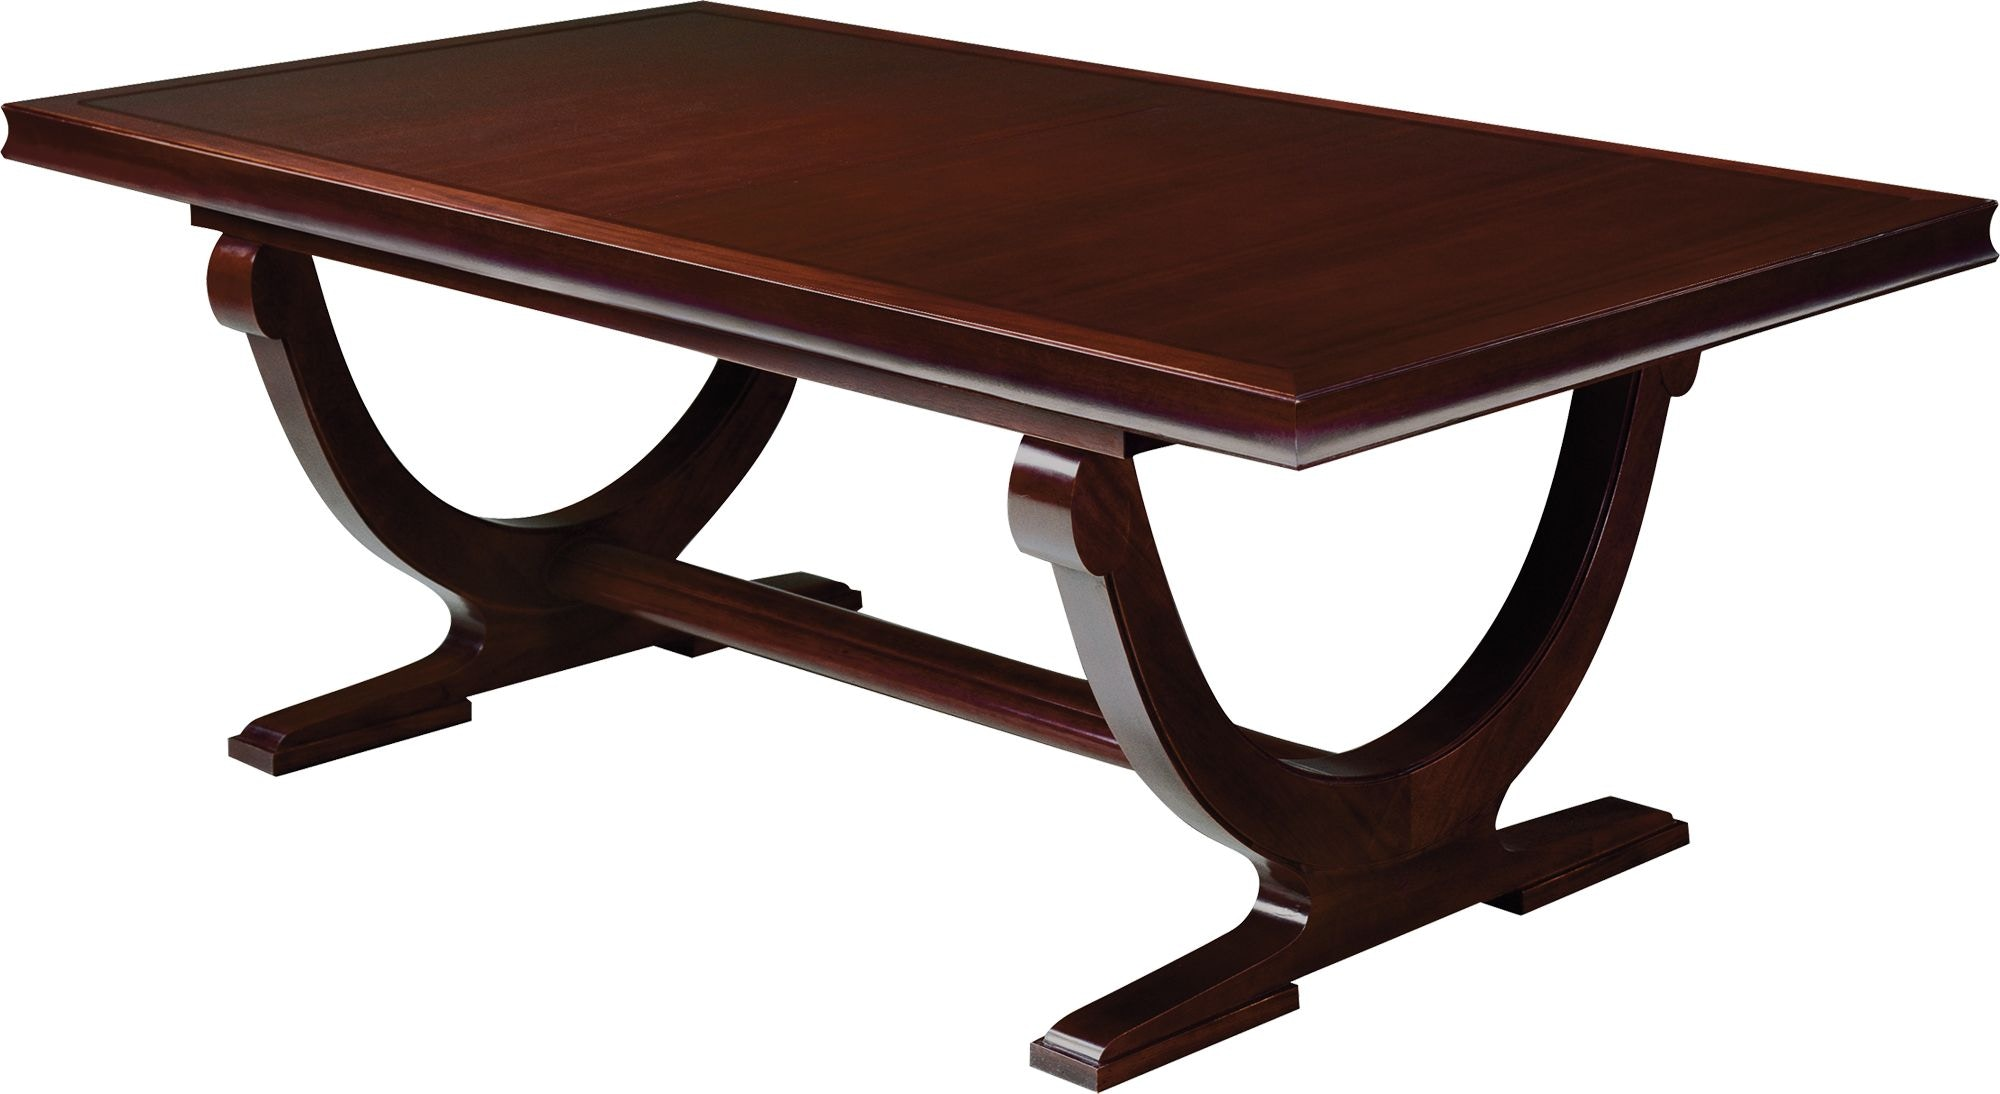 Baker Furniture Barbara Barry Rectangular Dining Table 3436